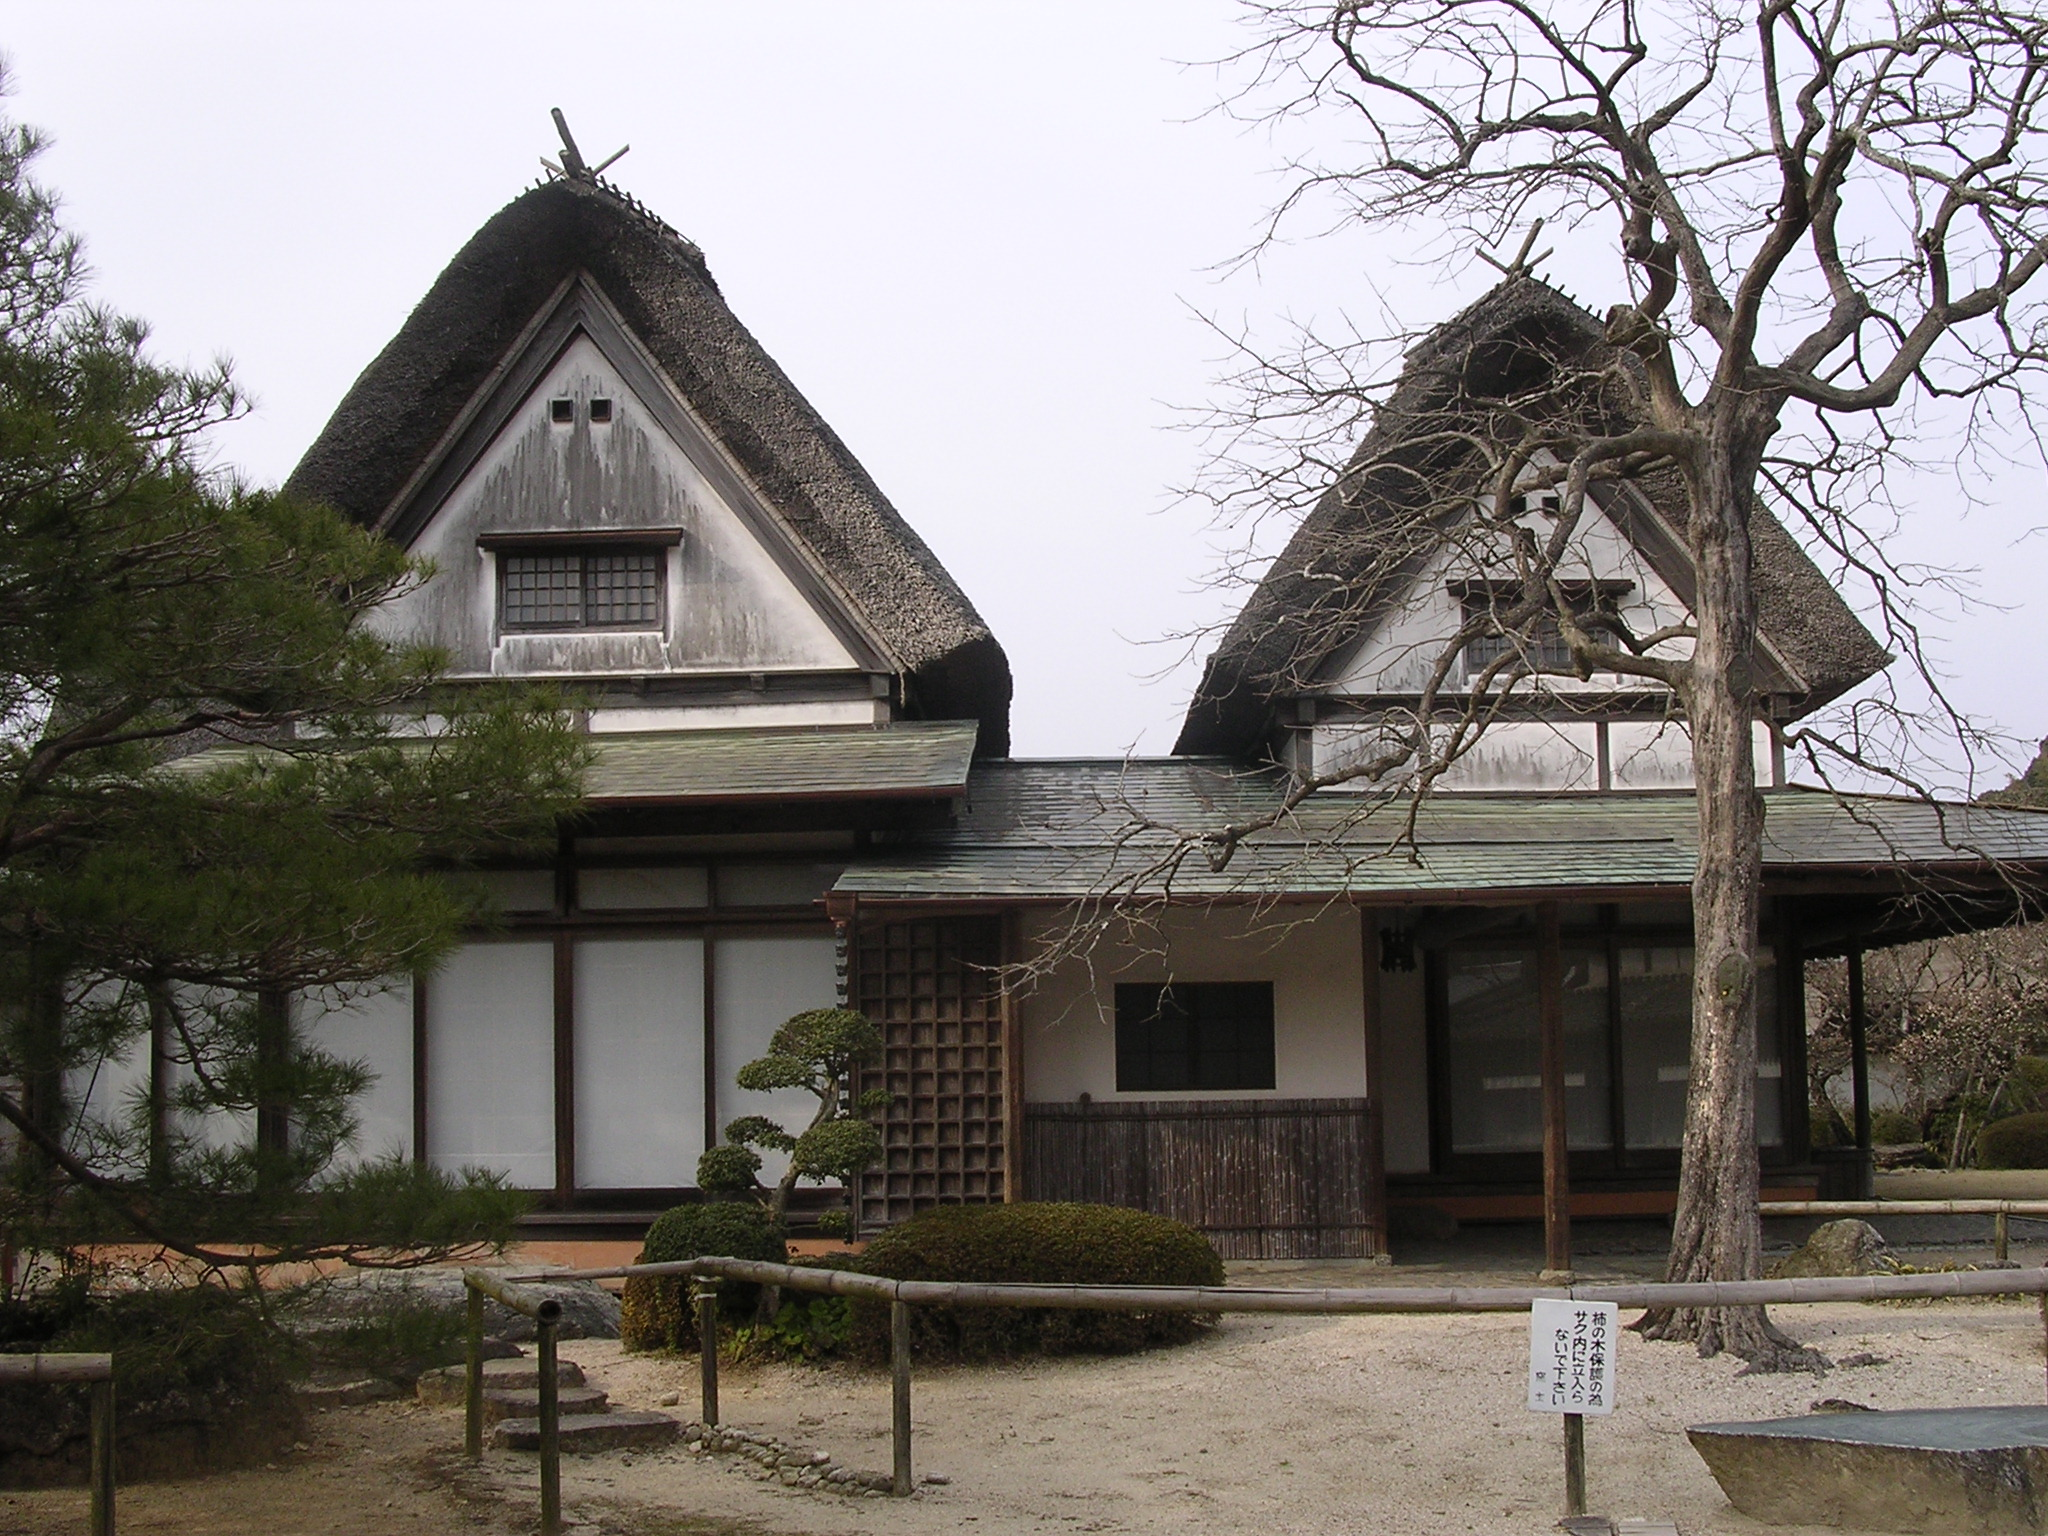 FileTraditional japanese housejpg  Wikimedia Commons